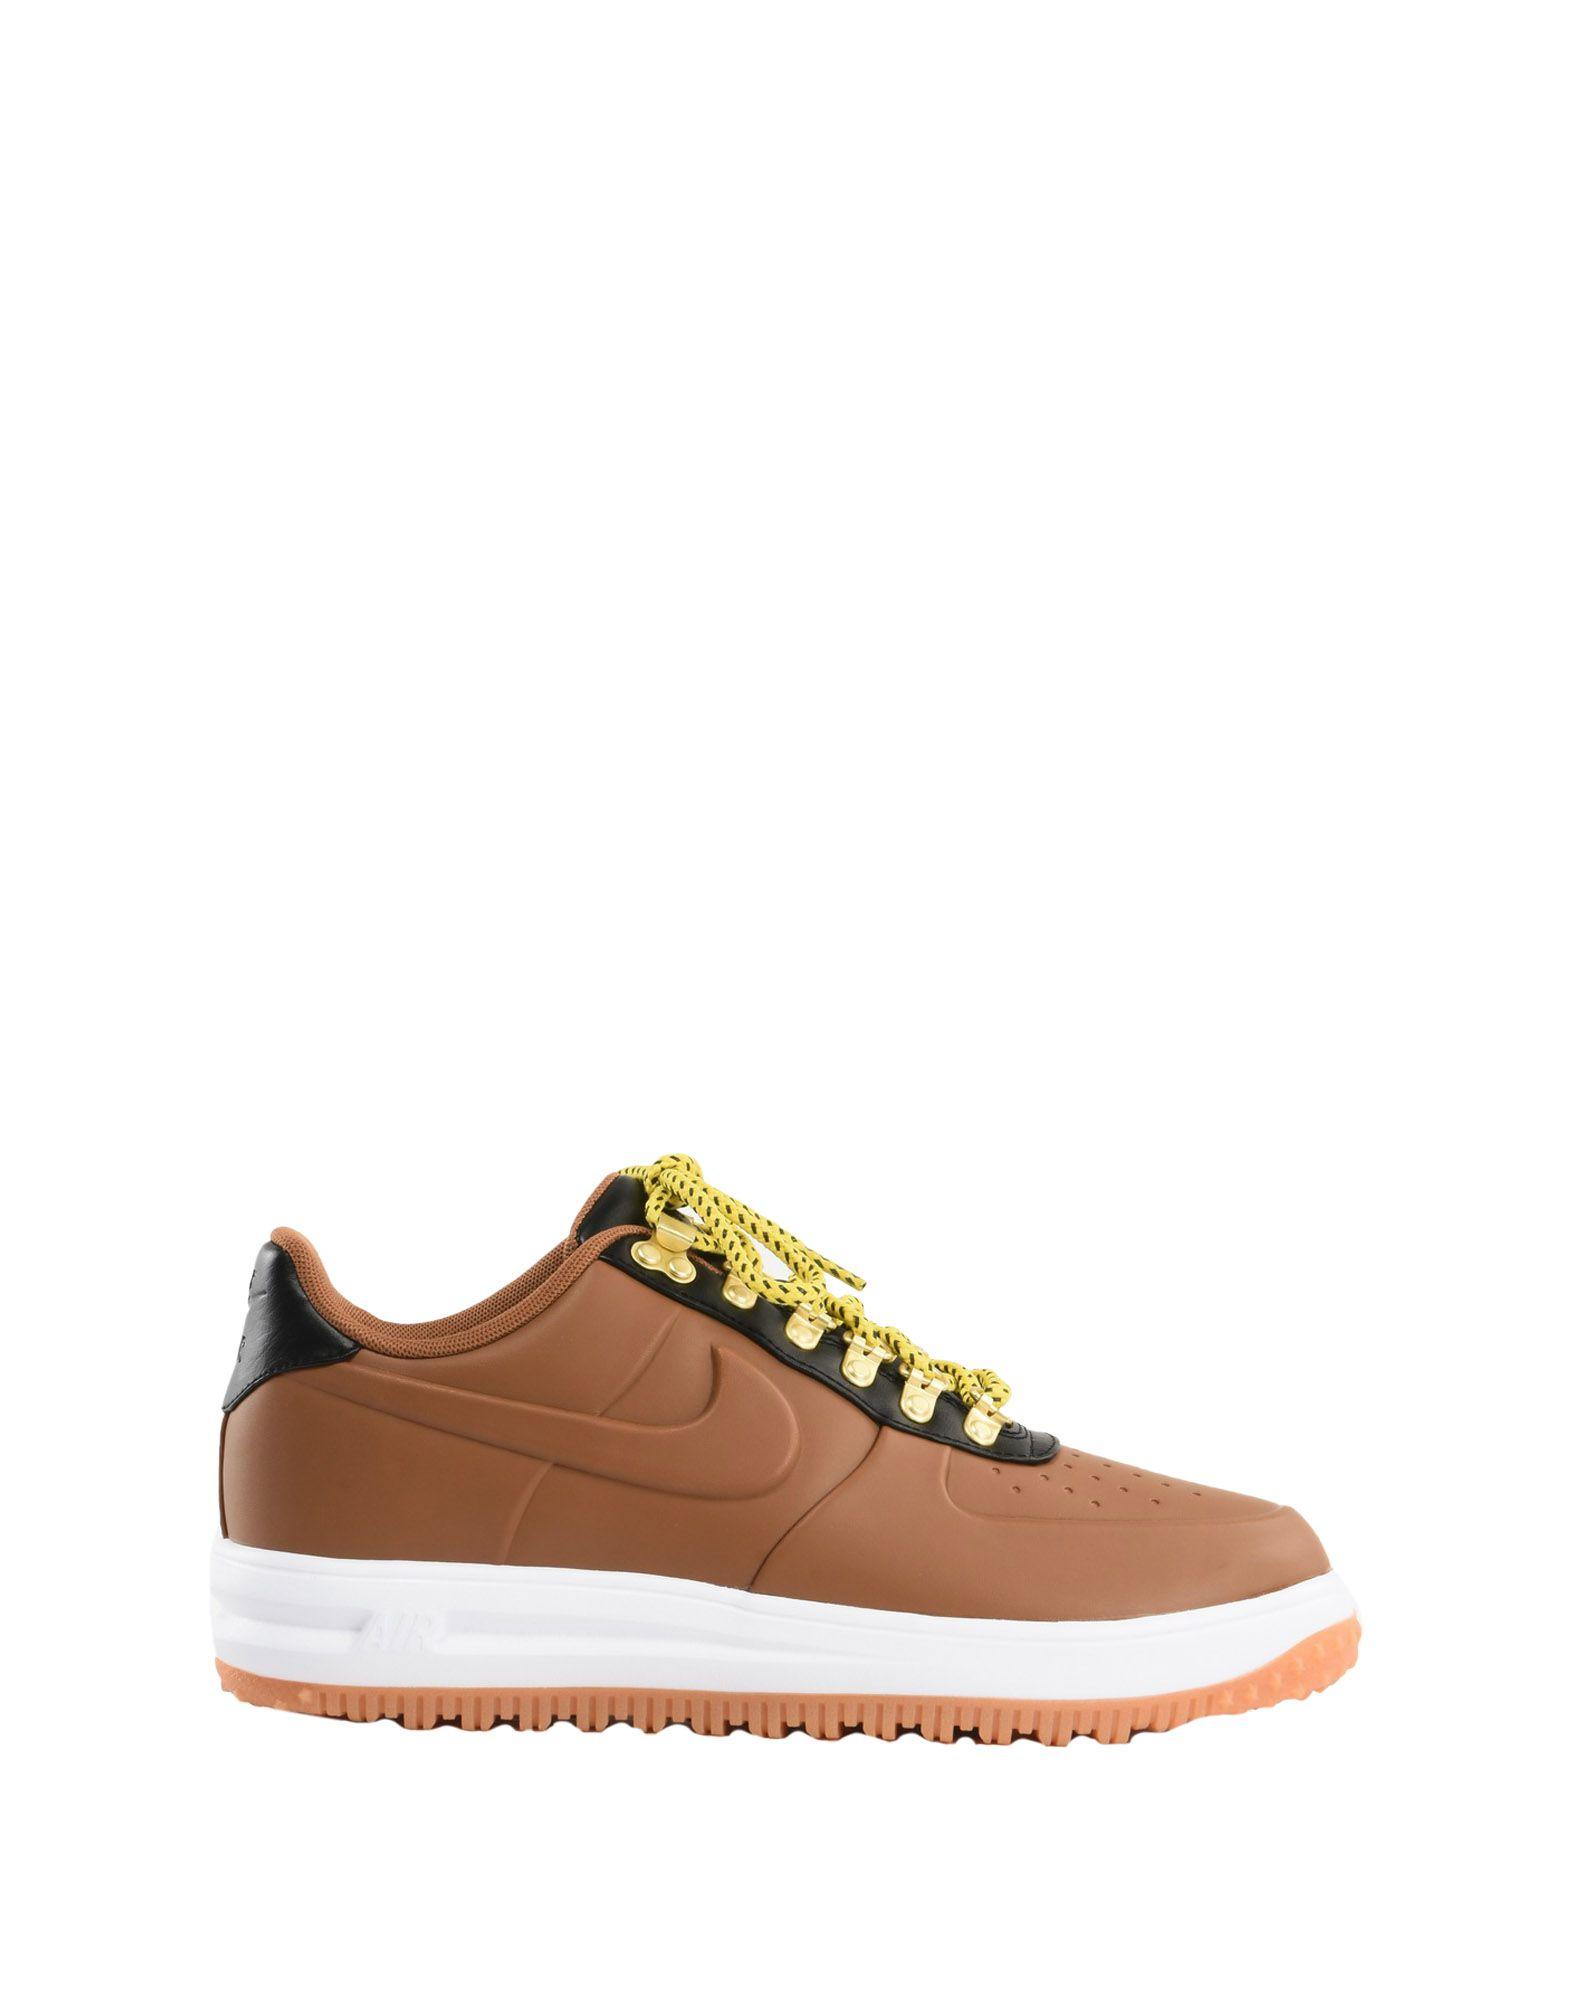 Nike Lf1 Duckboot Low   11413753HB 2cede9